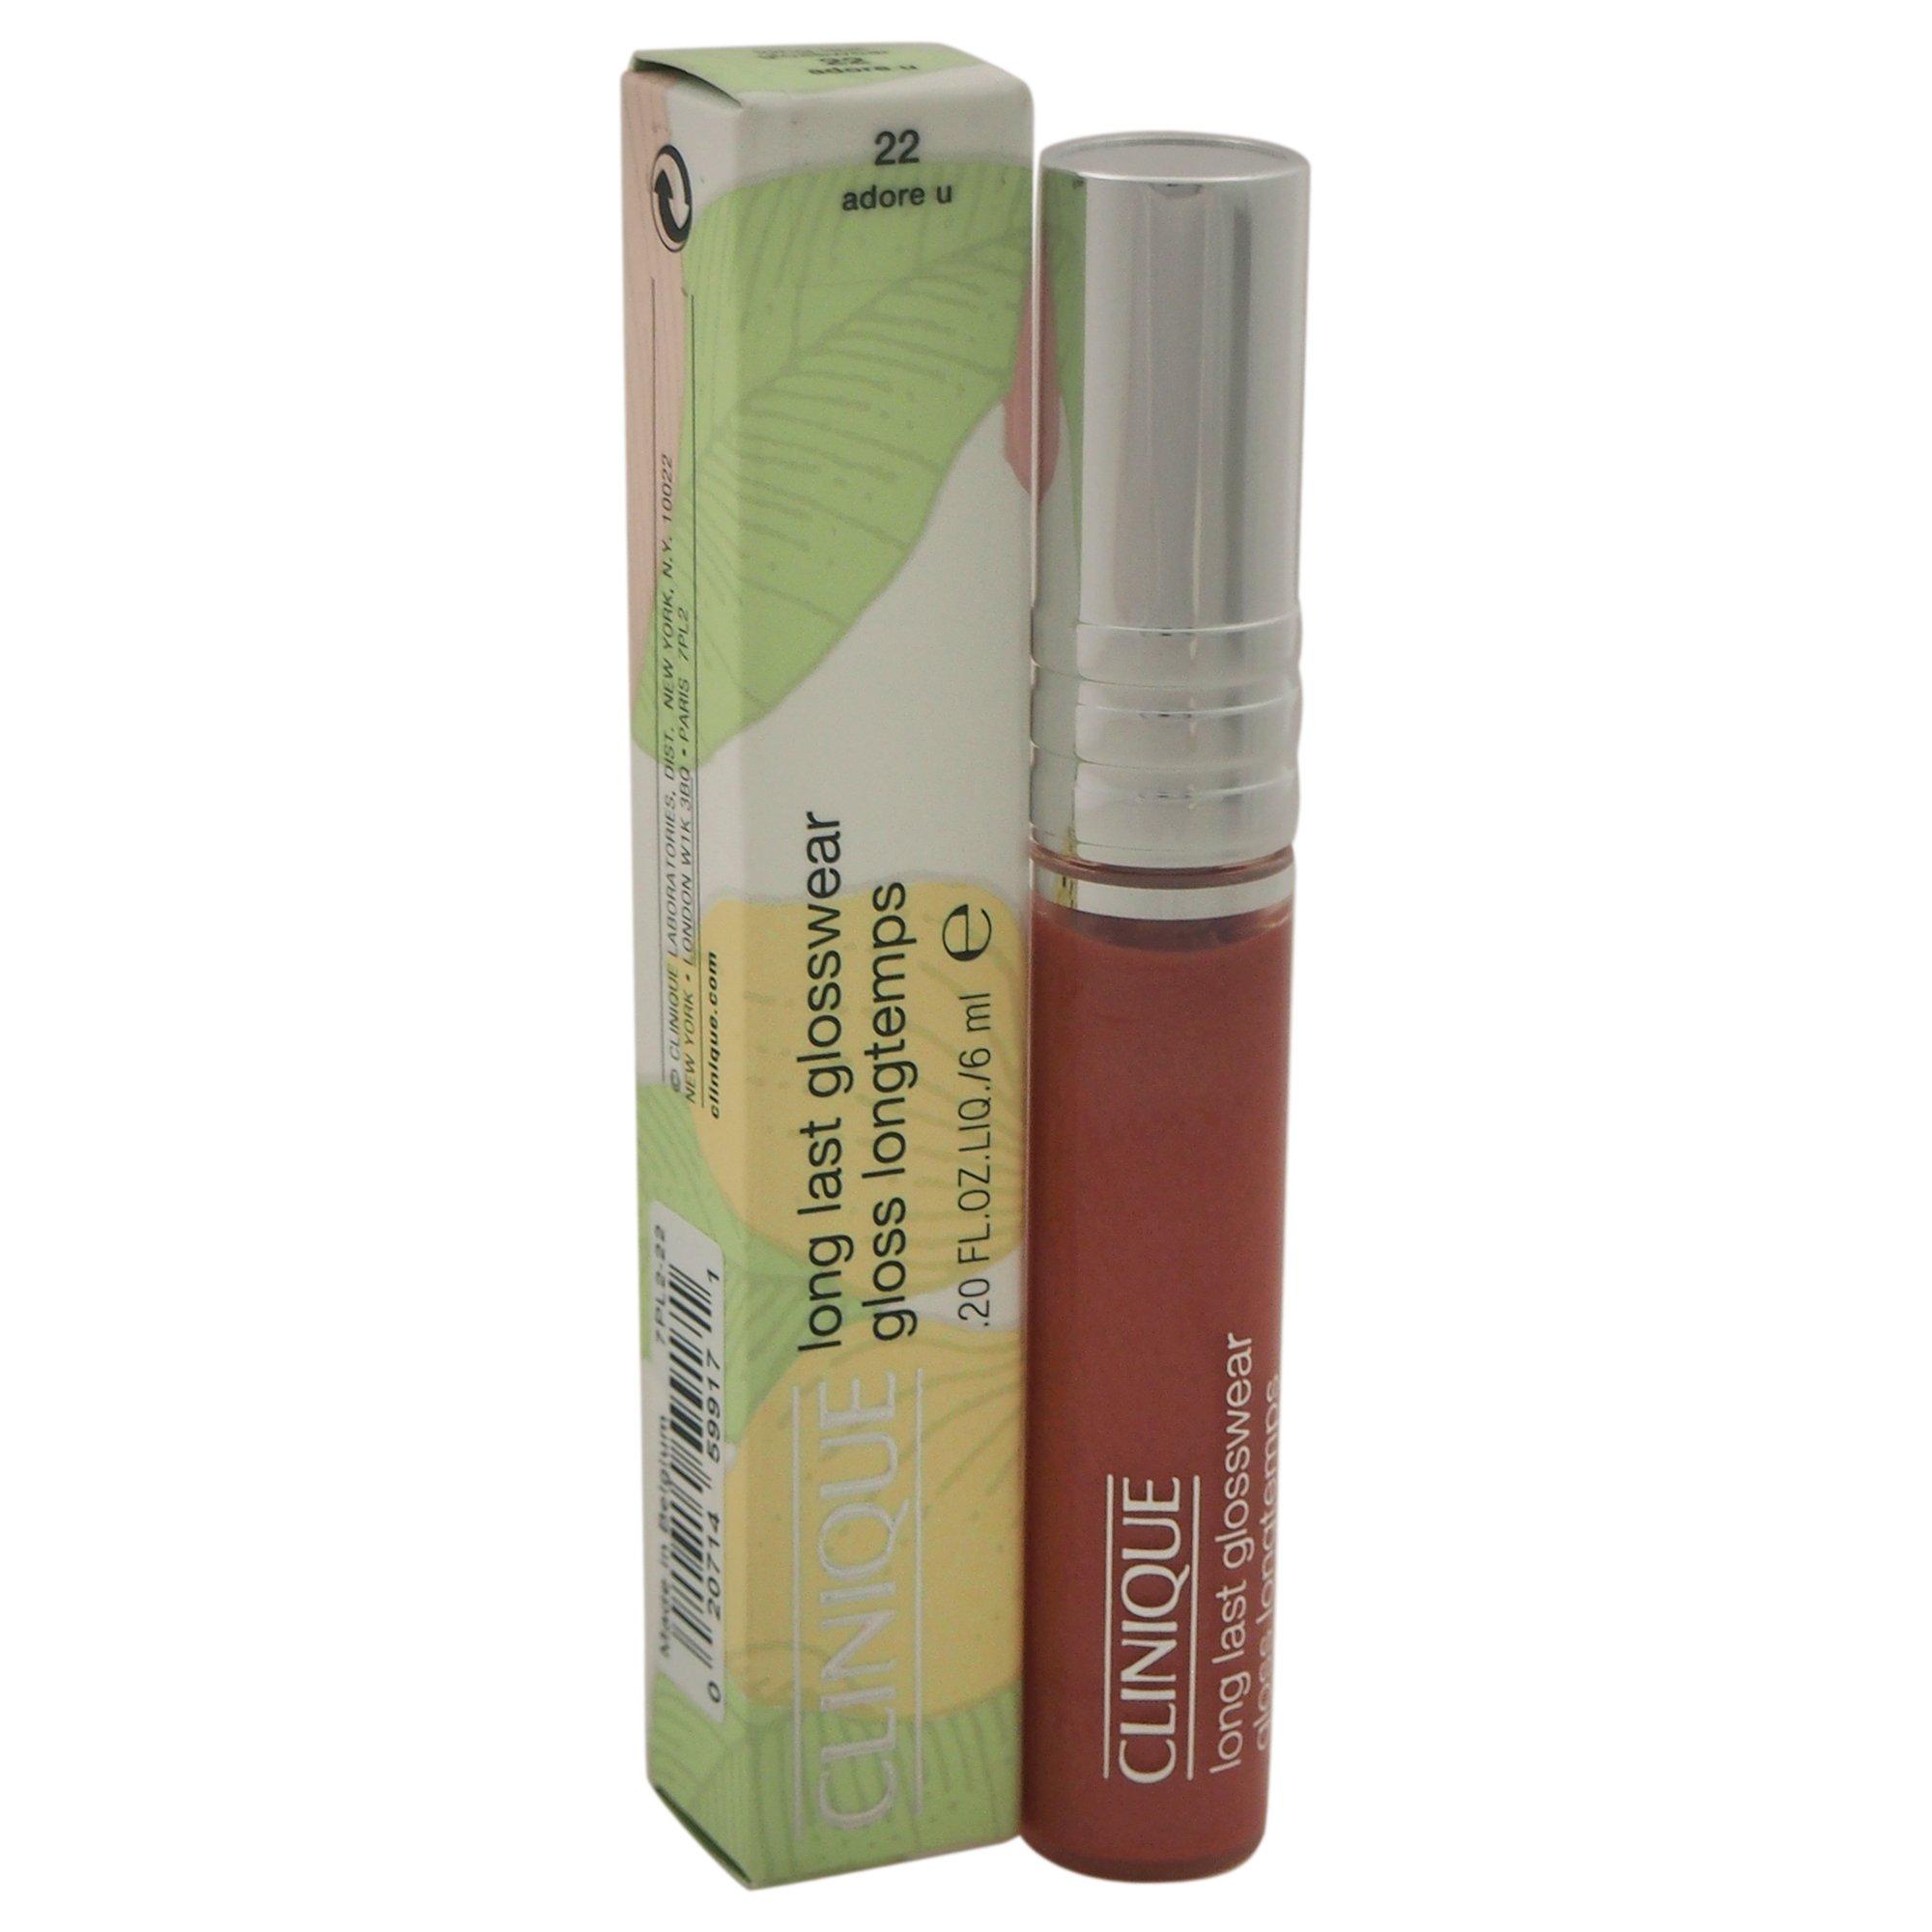 Clinique Long Last Glosswear Lip Gloss, 22 Adore U, 0.20 Ounce by Clinique